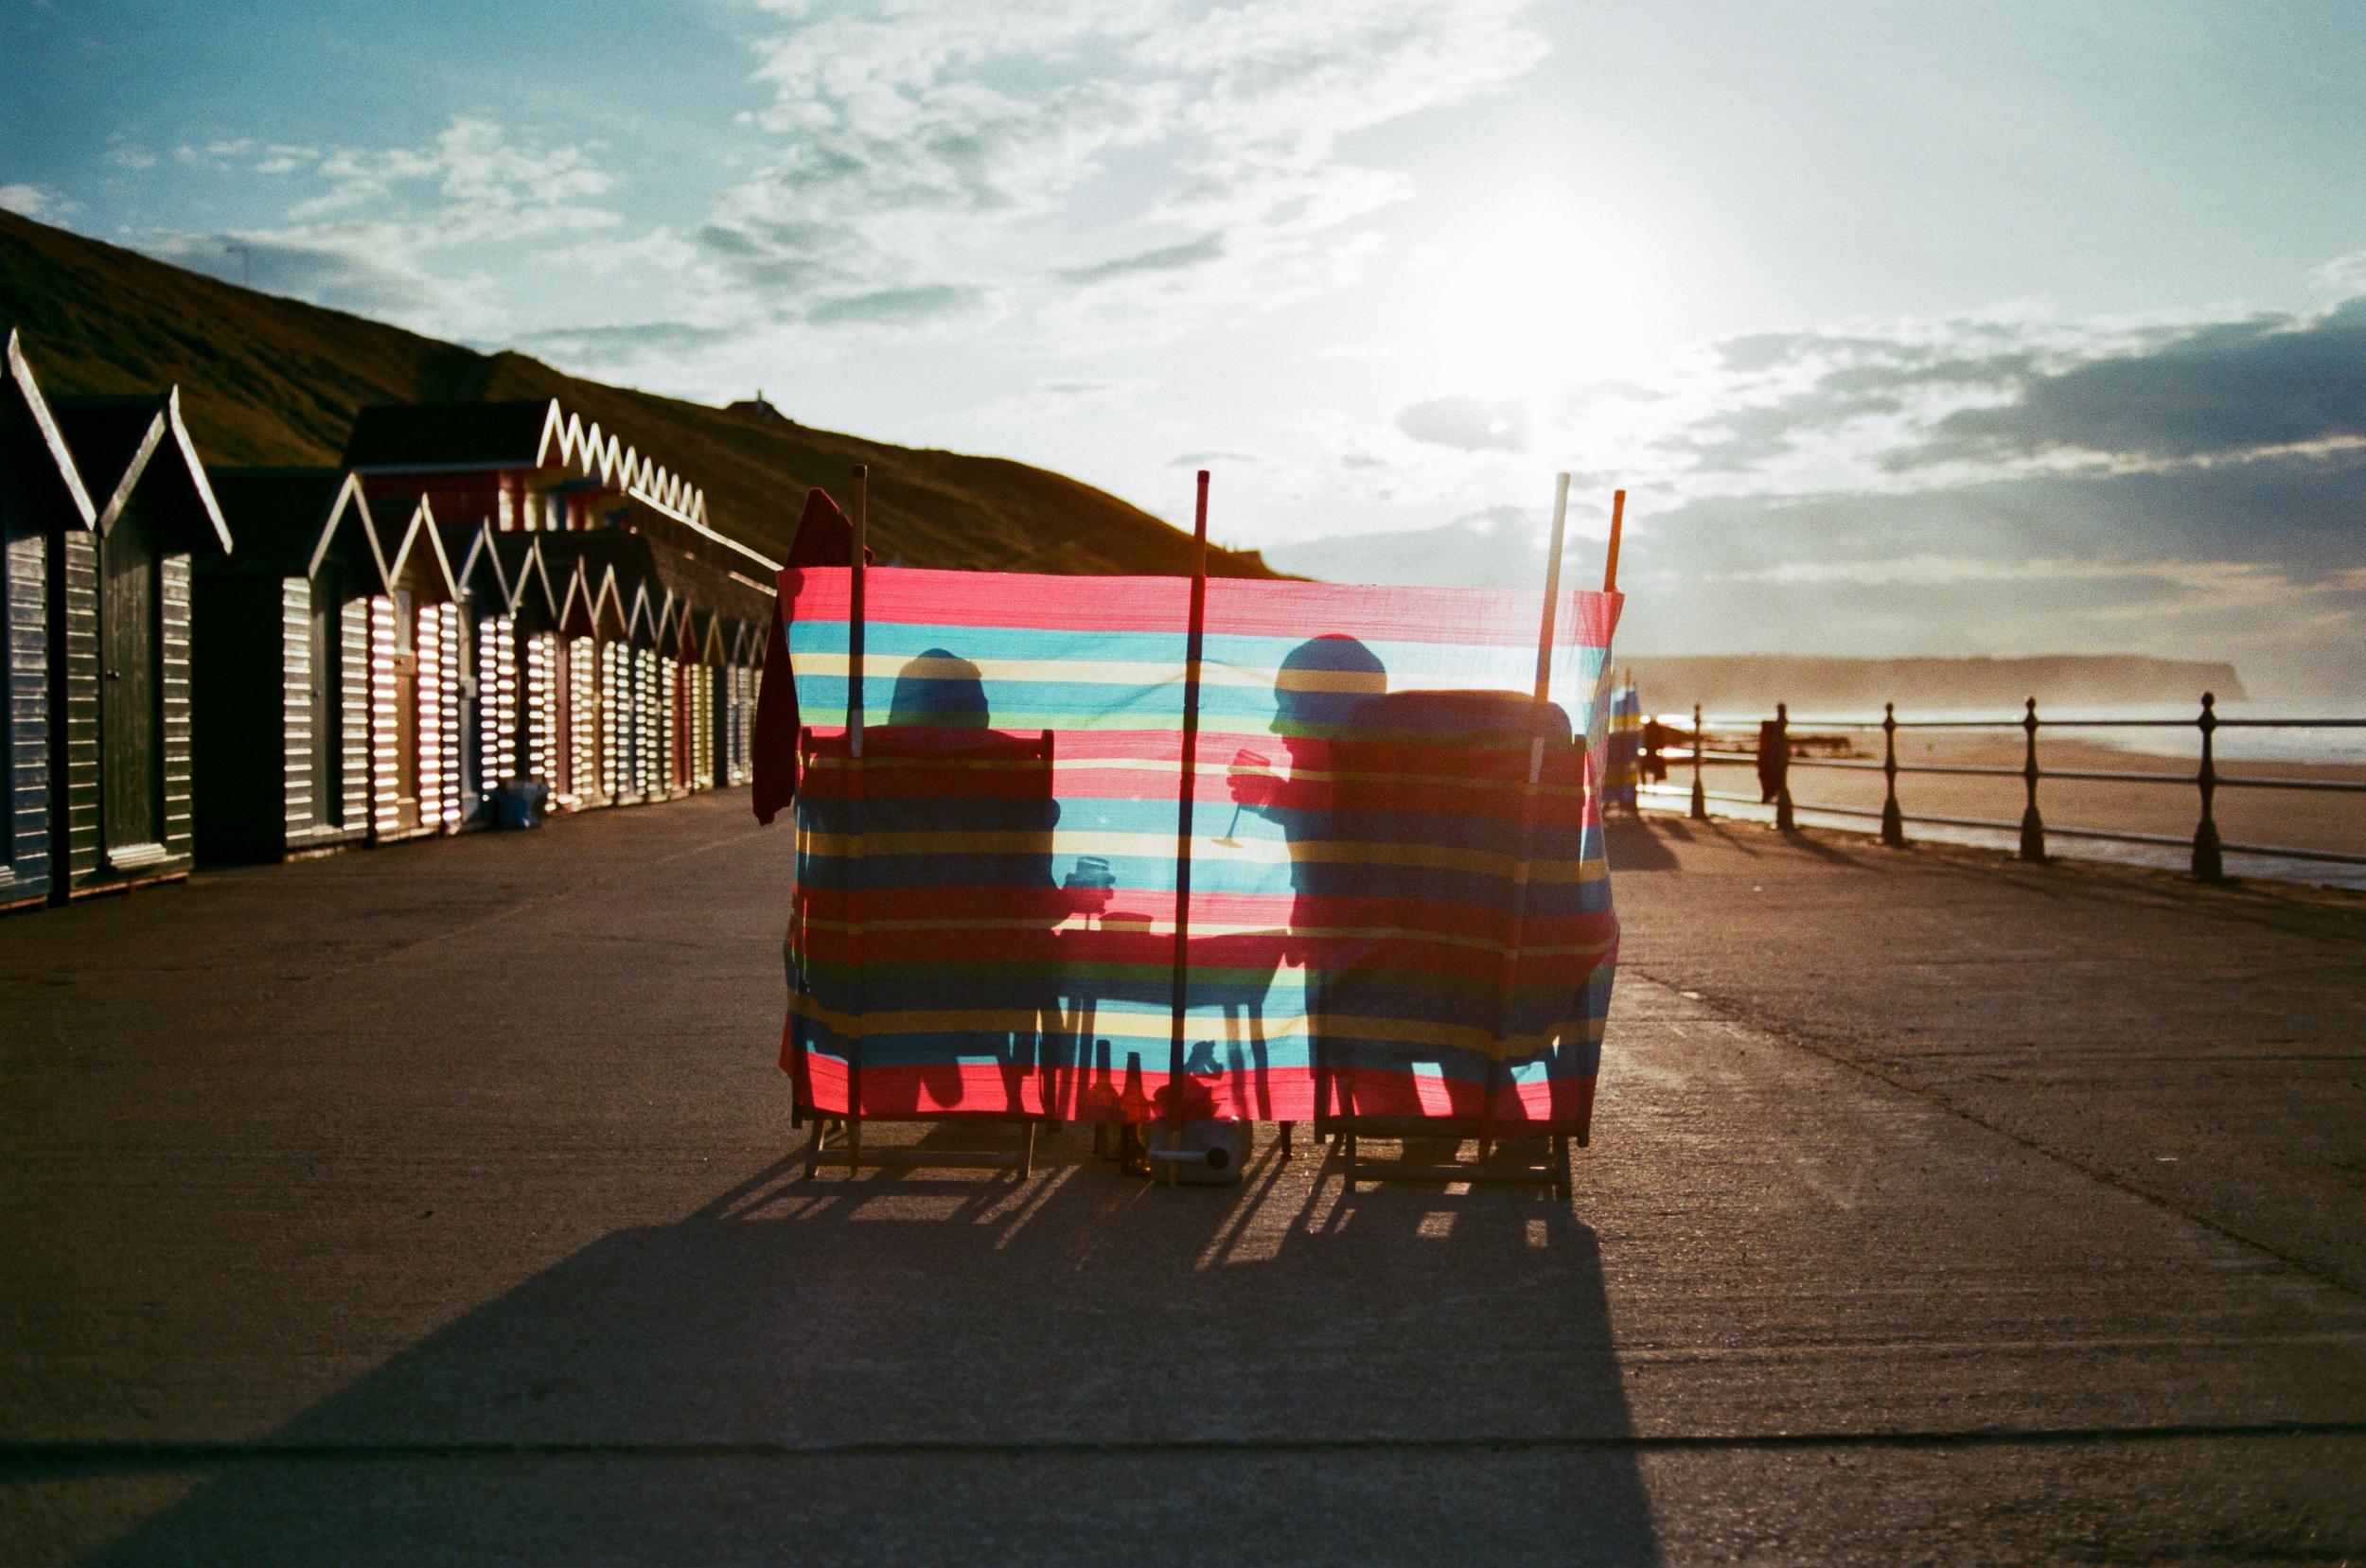 Whitby Beach Huts   Nikon F5   35mm   Agfa Vista 200   Mark Hillyer